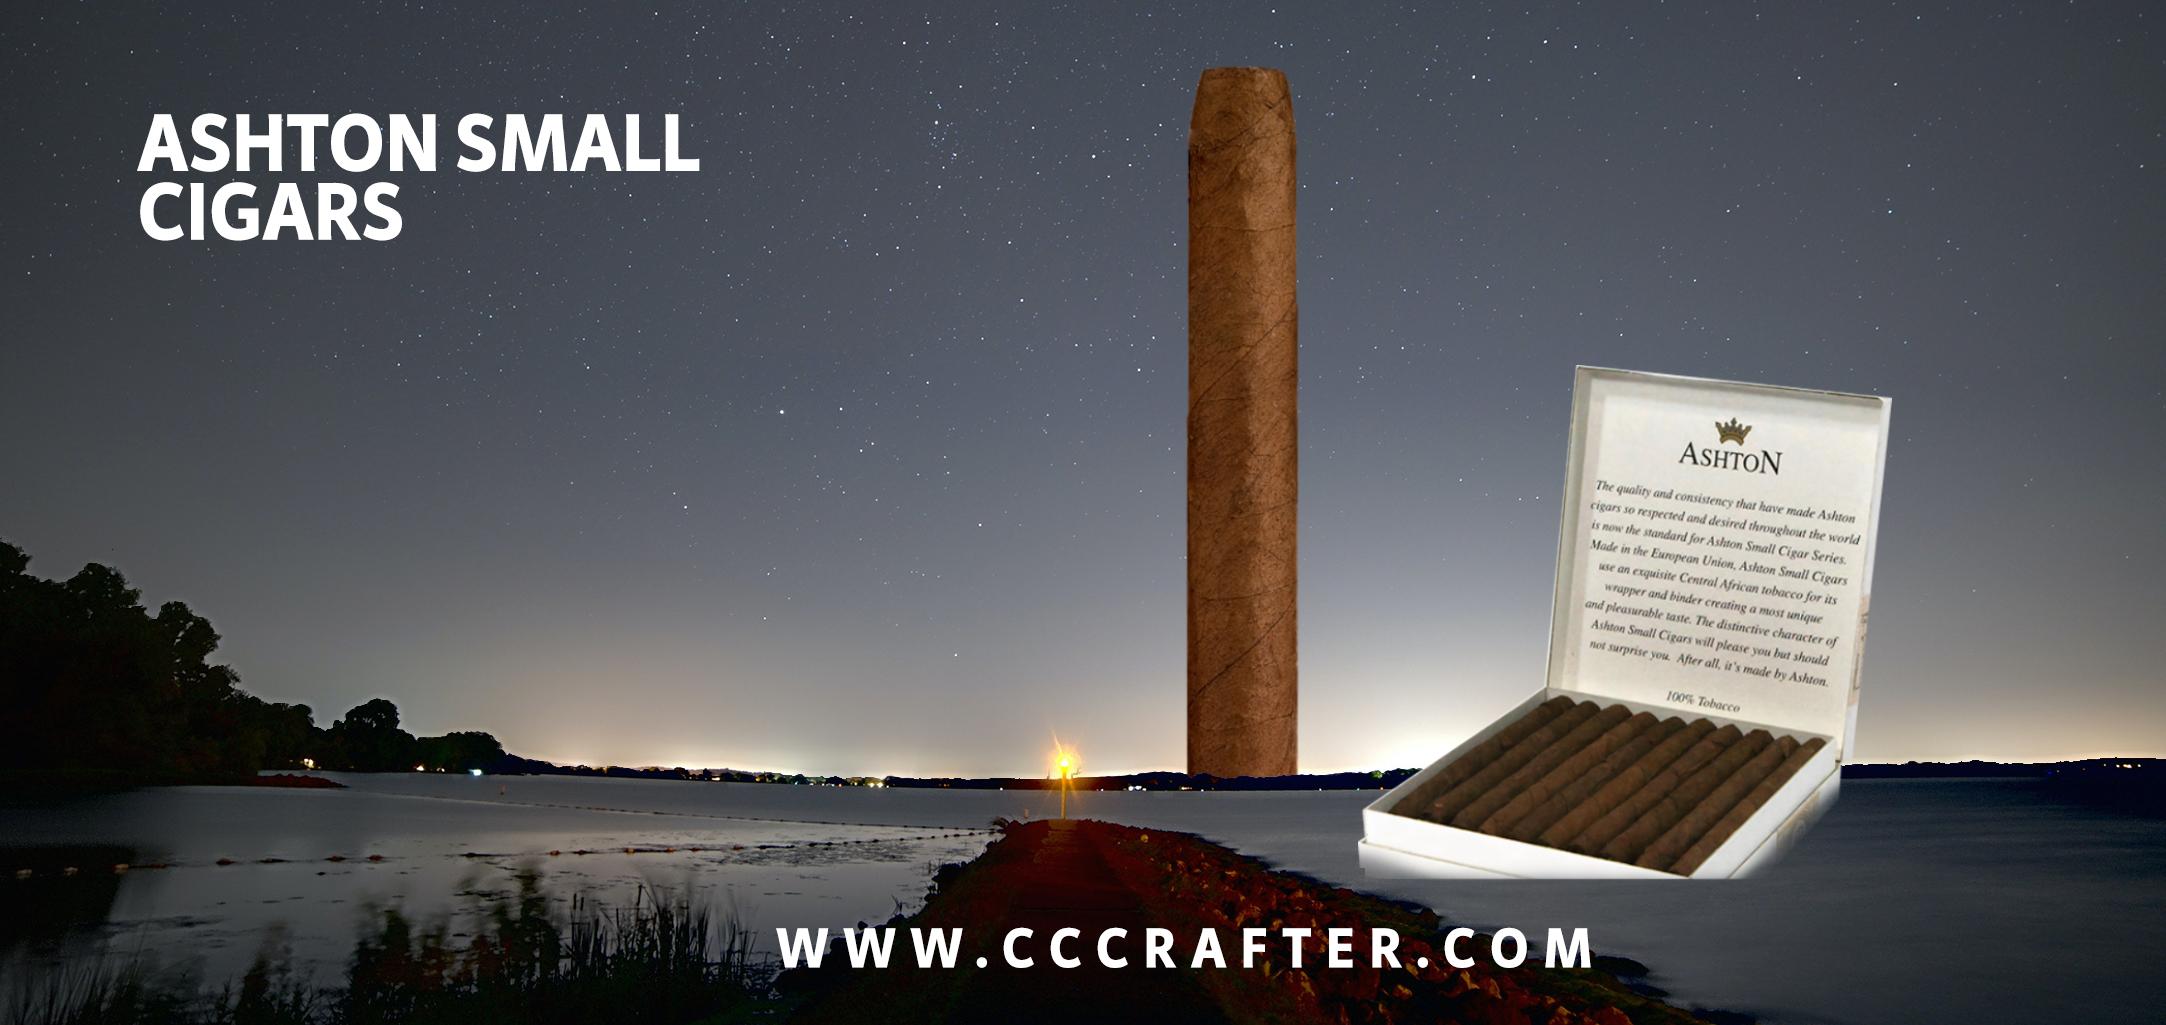 ashton-small-cigars.jpg